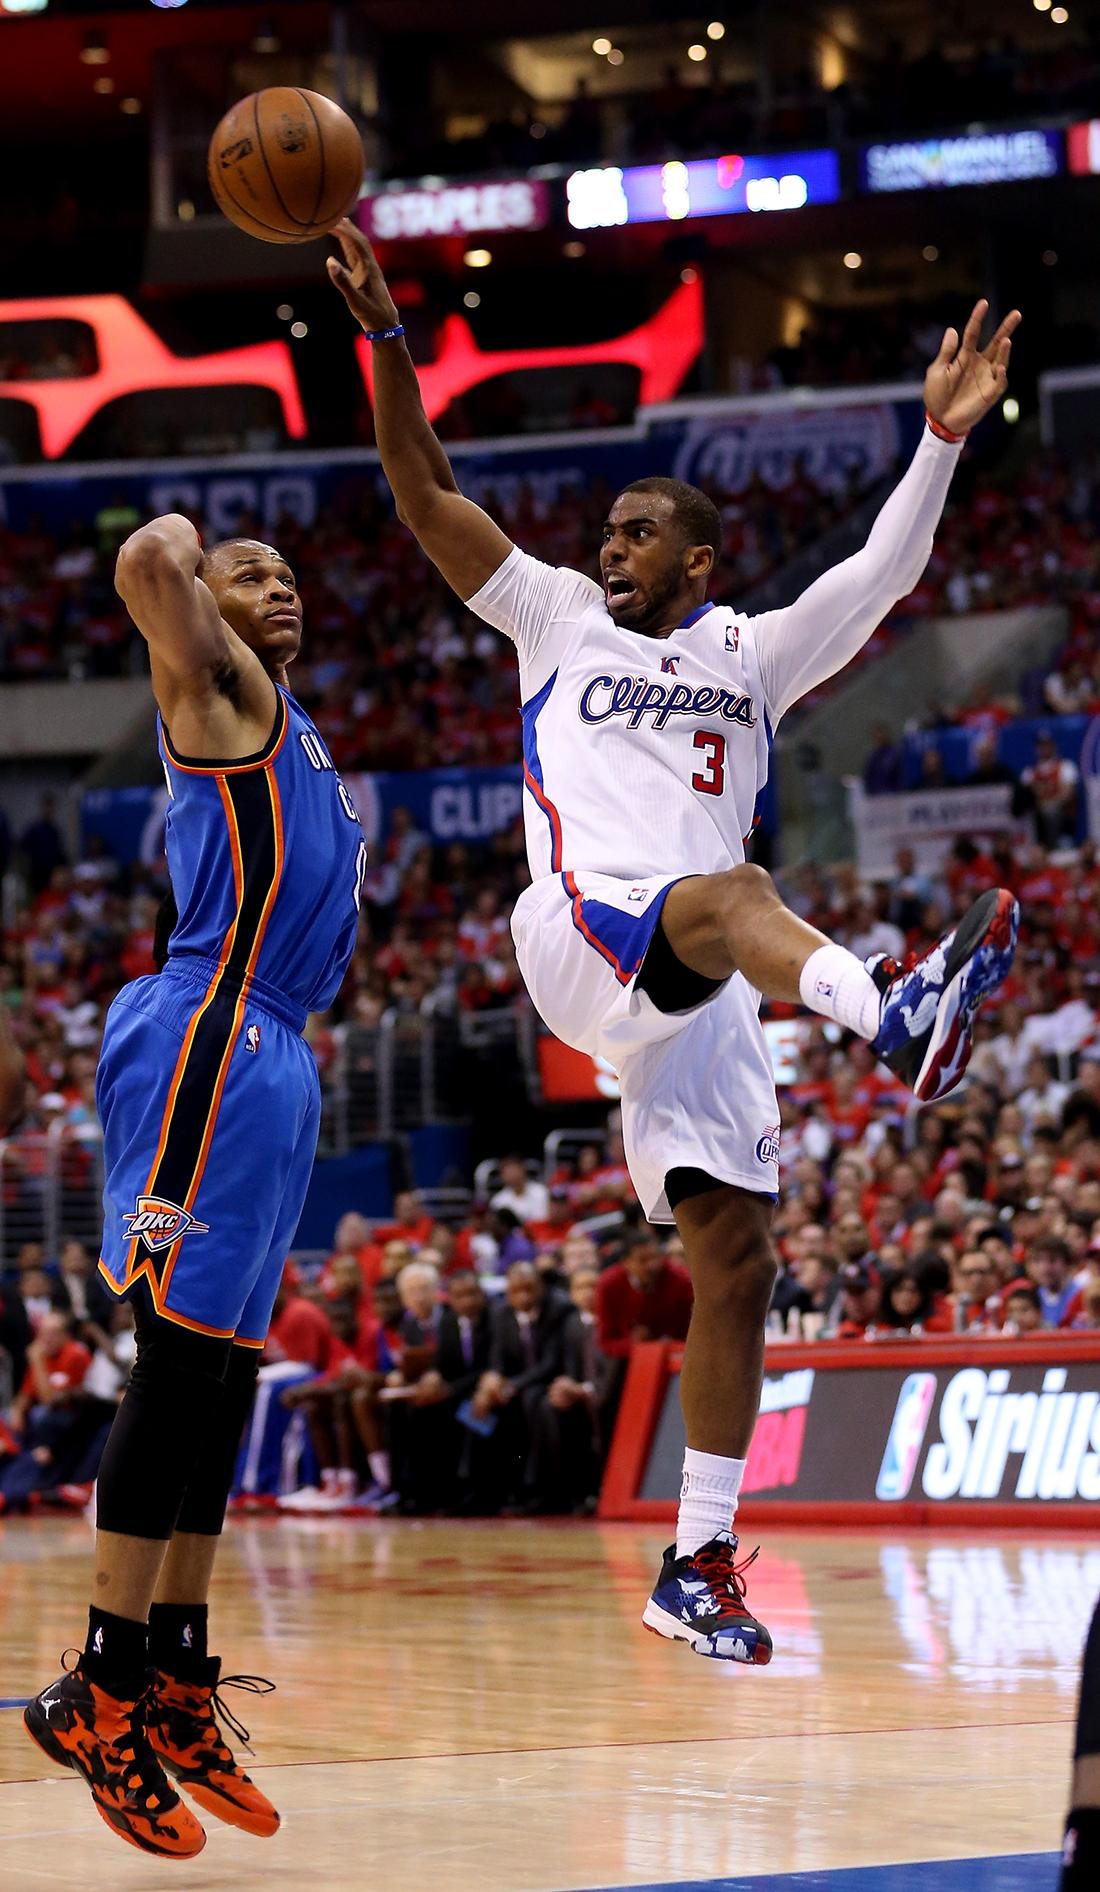 clippers siguen en problemas en viva basquet